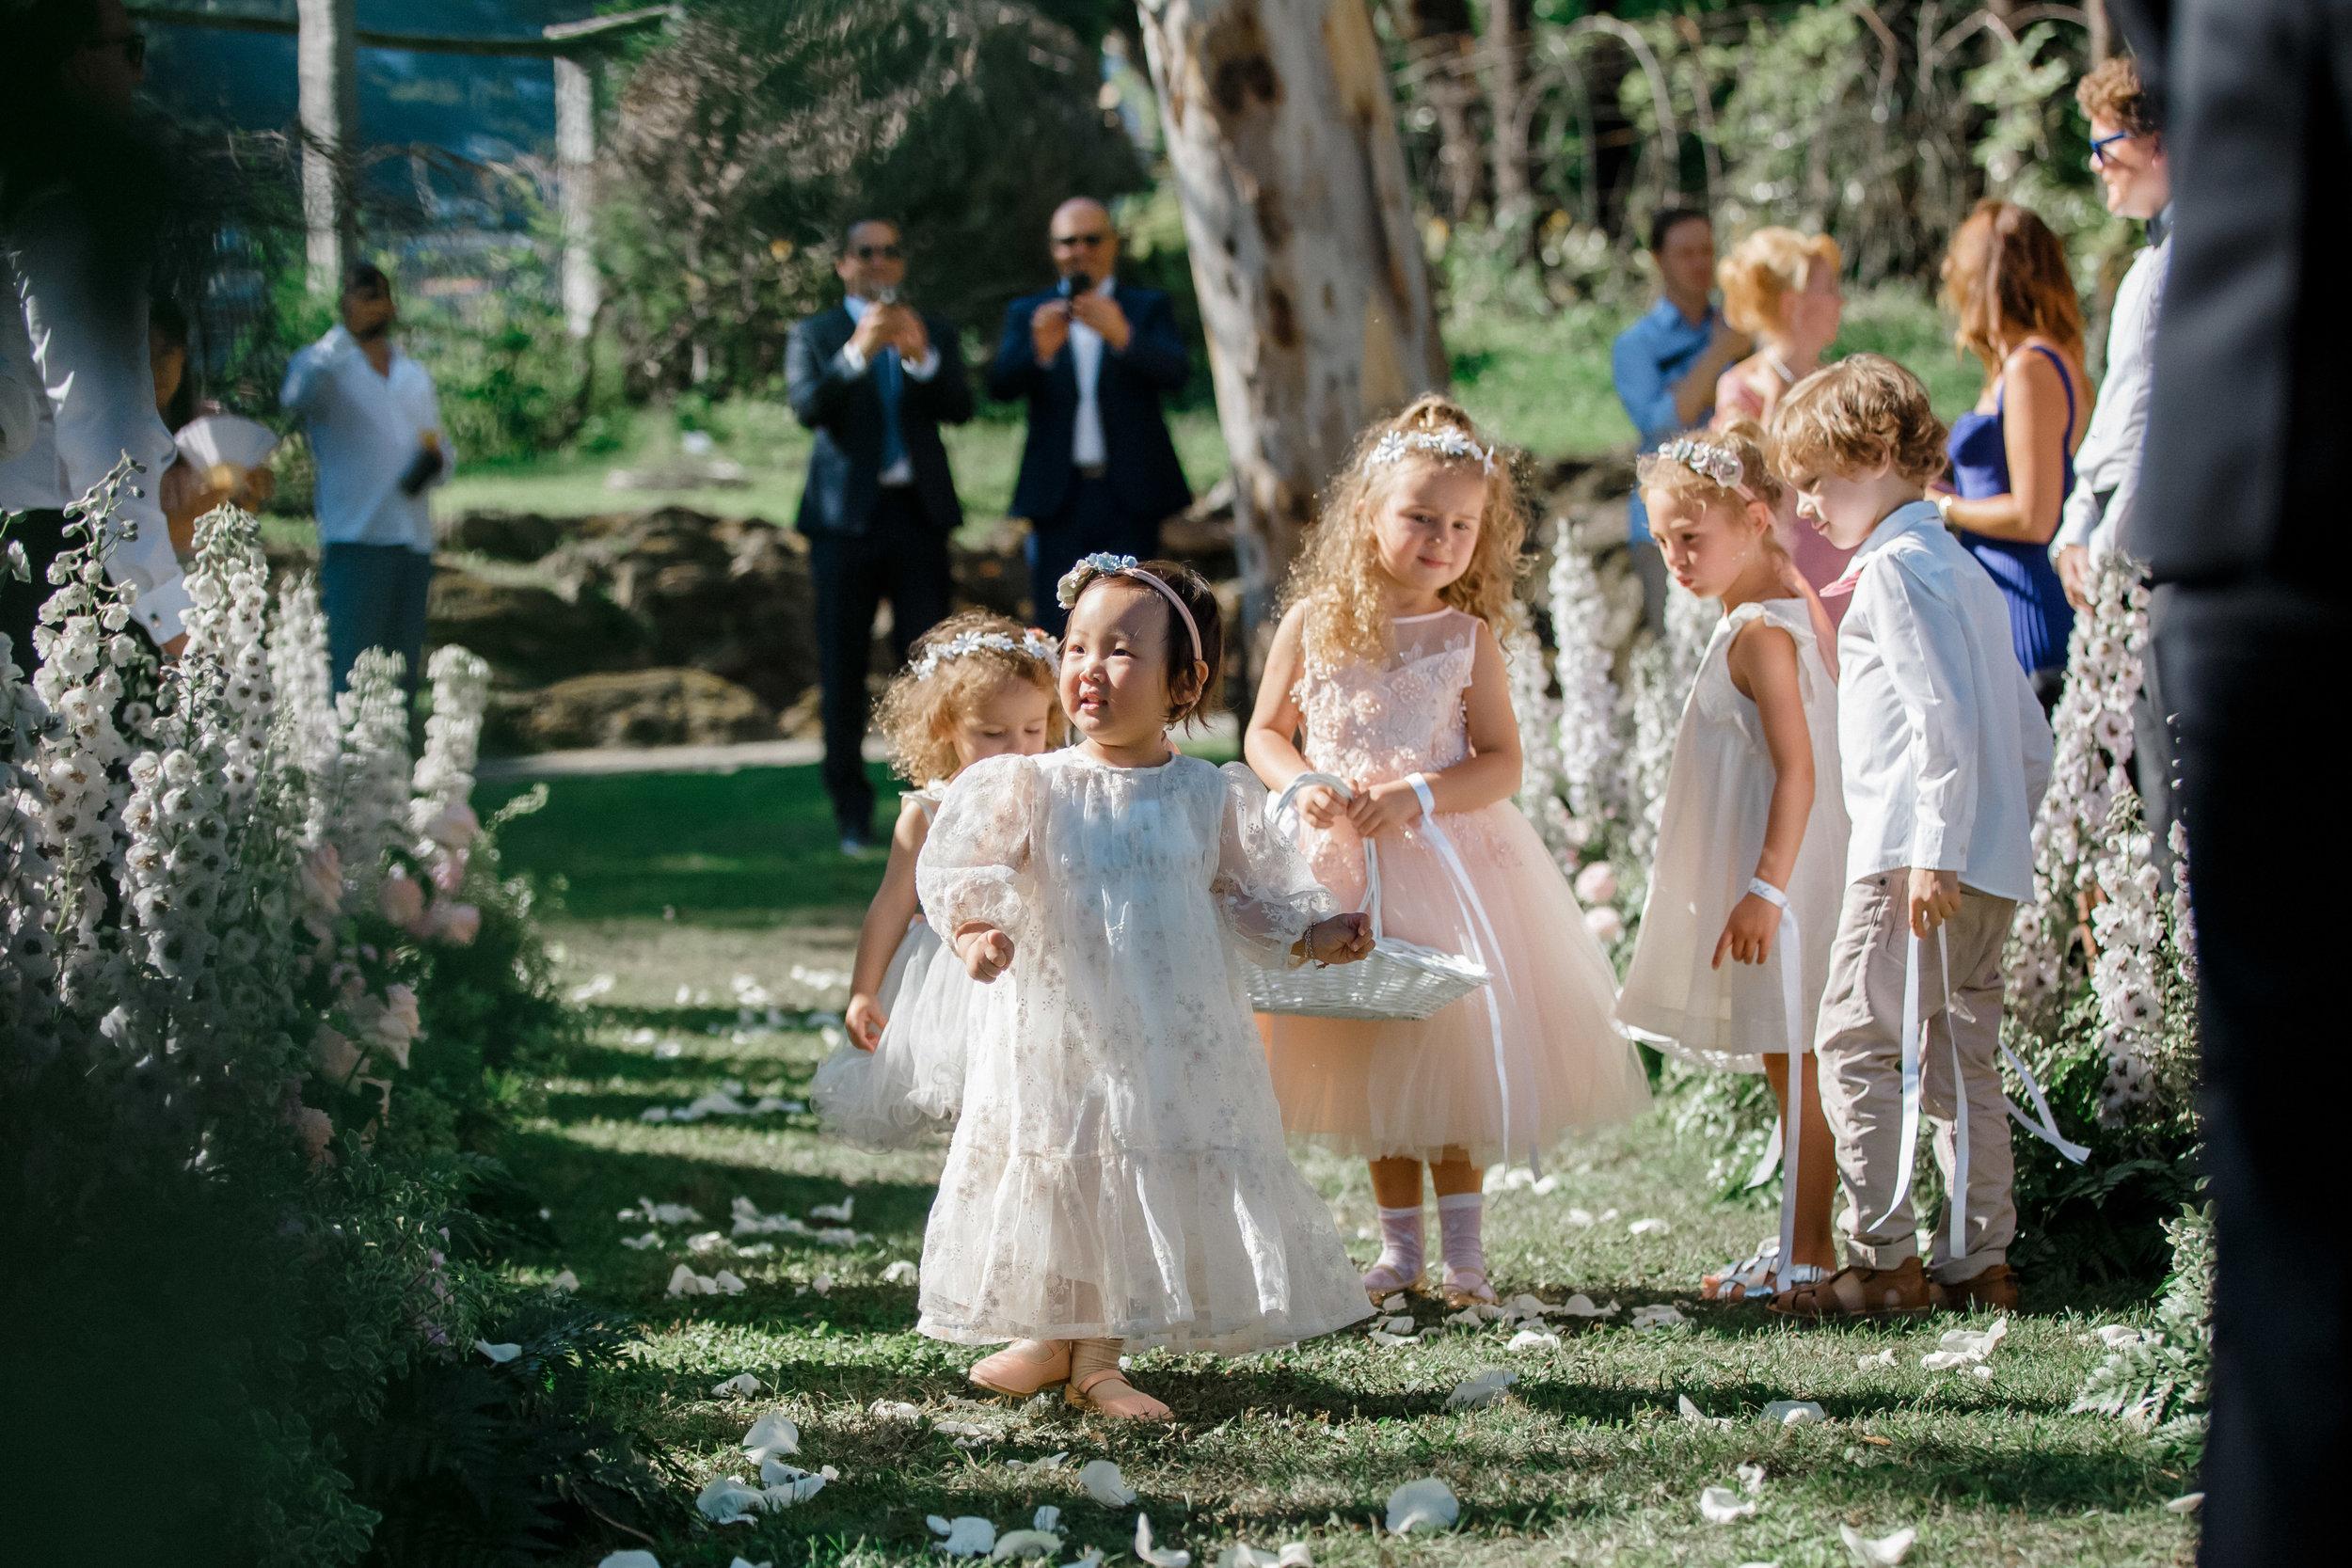 180707-preview-043-Marina-Fadeeva-wedding-photographer (1).jpg